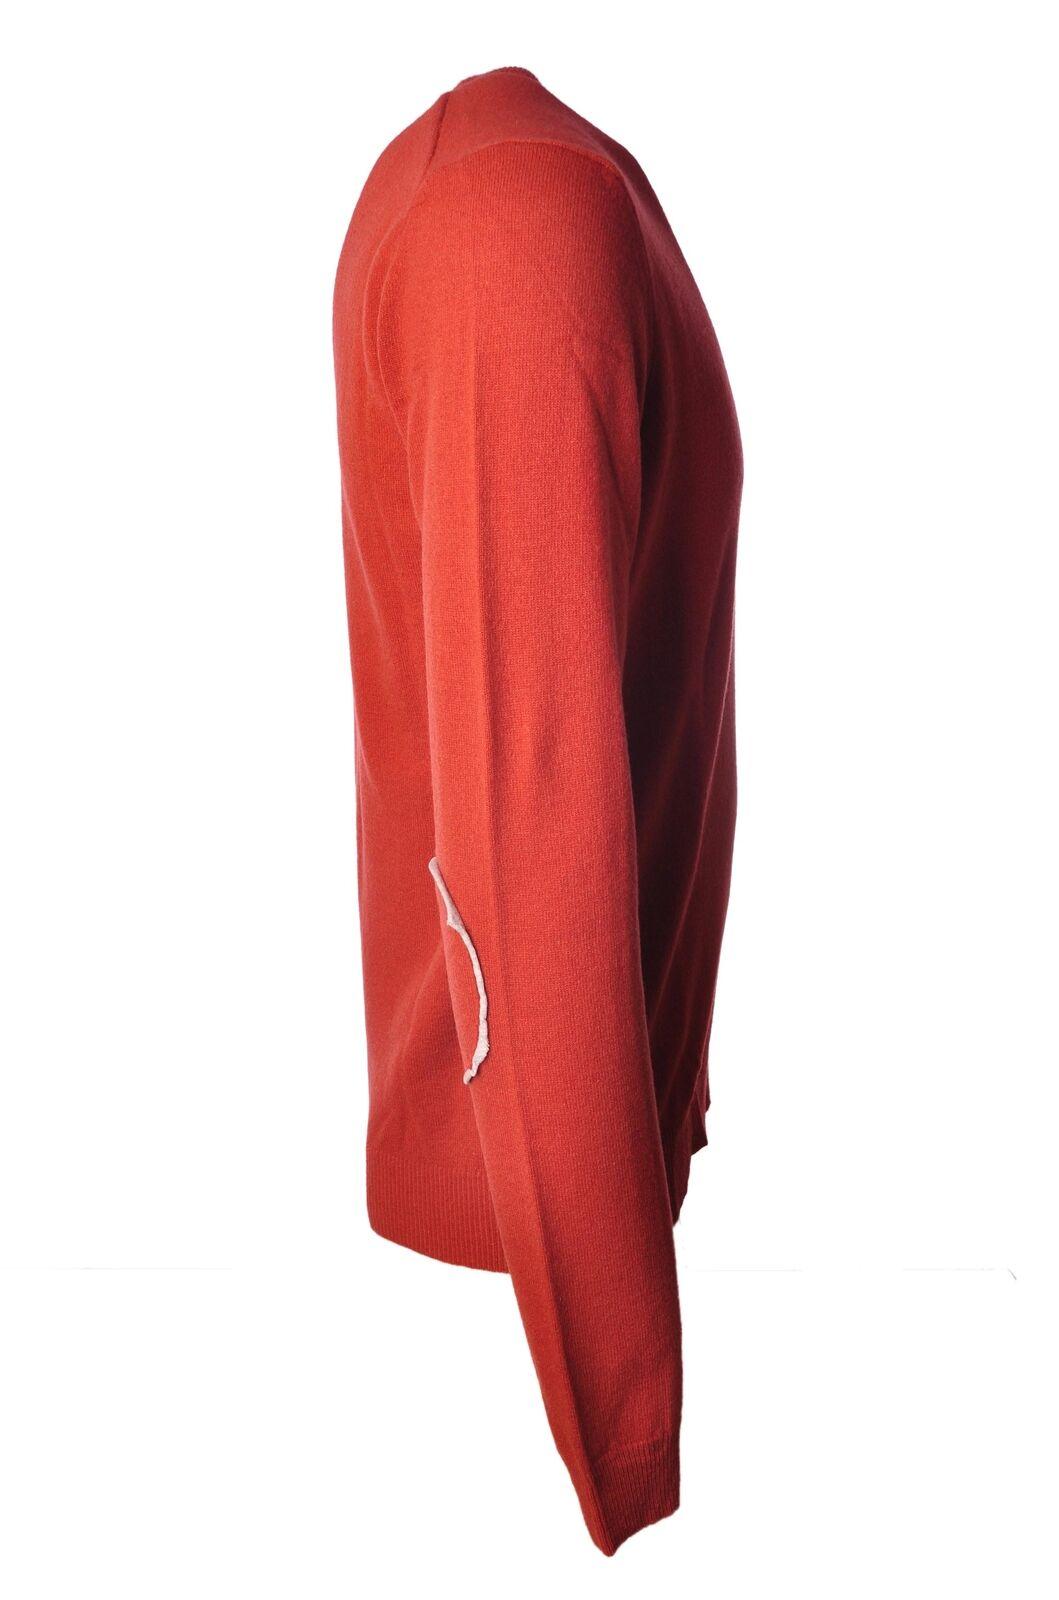 Diktat - Knitwear-Sweaters - 4340716N184336 Man - blu - 4340716N184336 - 8ffd1c